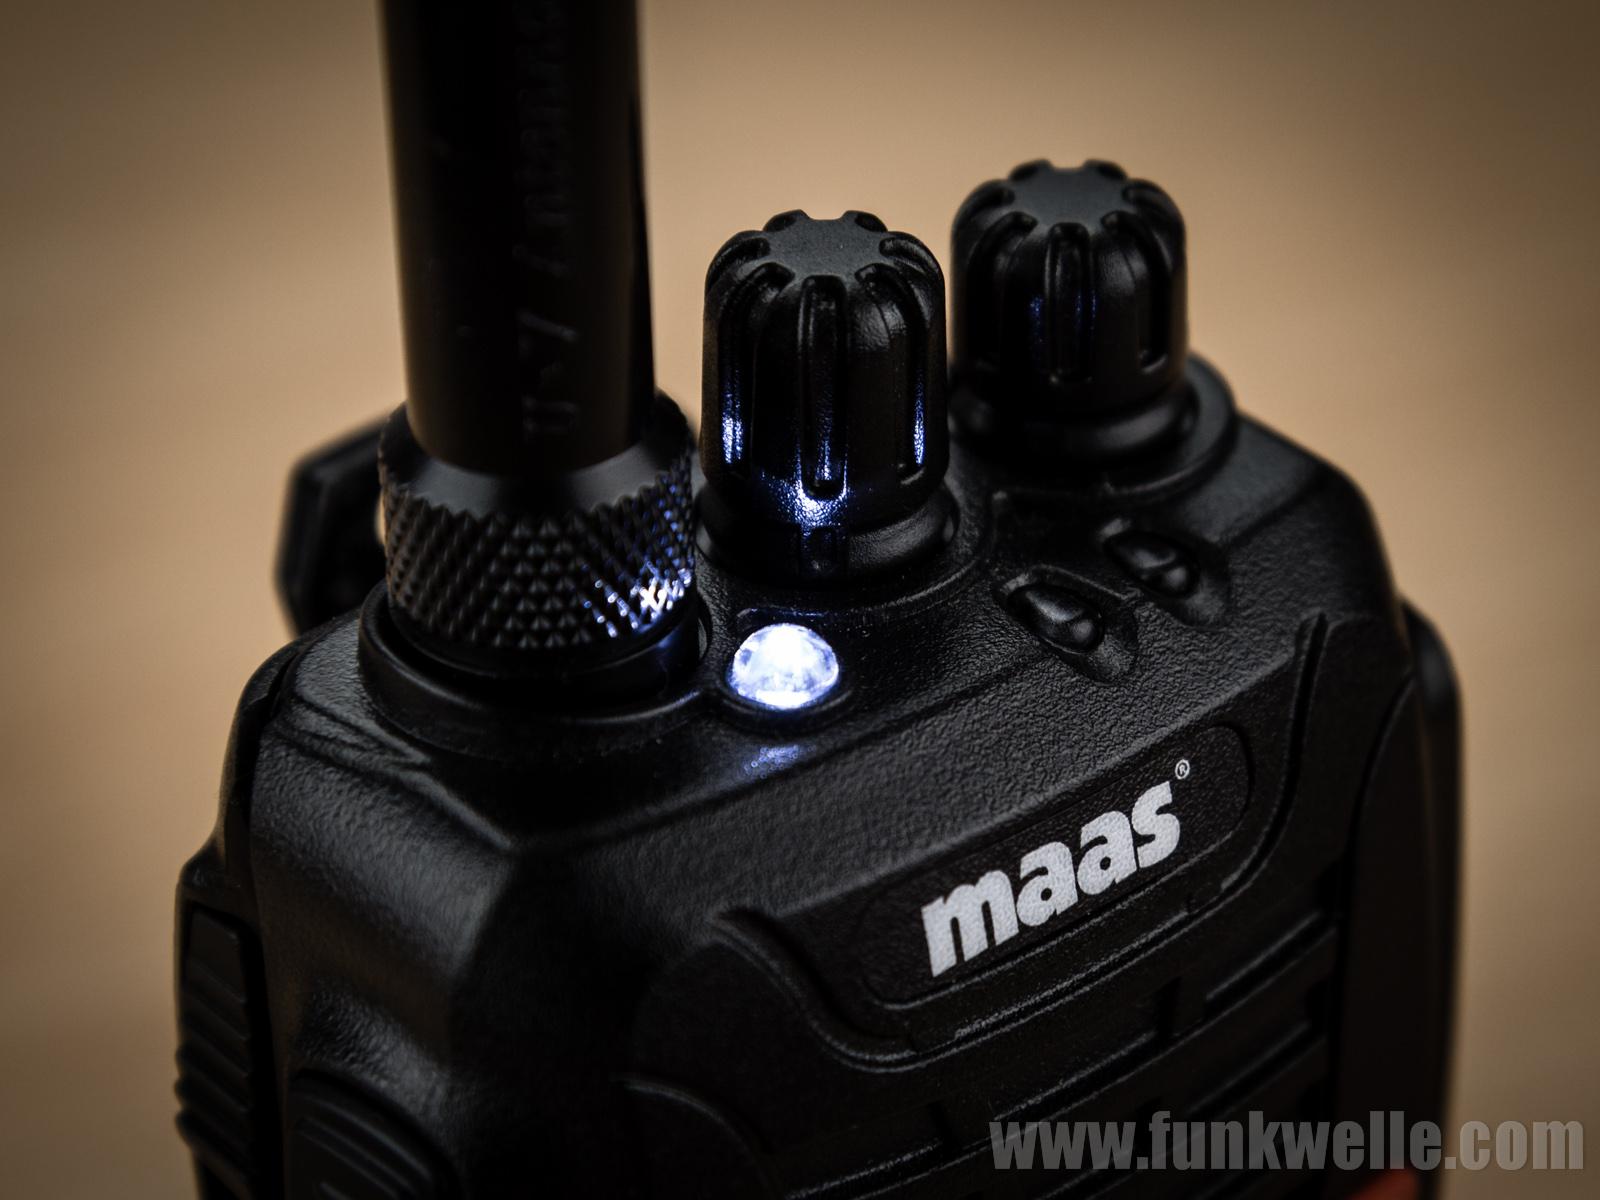 Maas AHT-6-UV / Wouxun KG-UV6D Taschenlampe